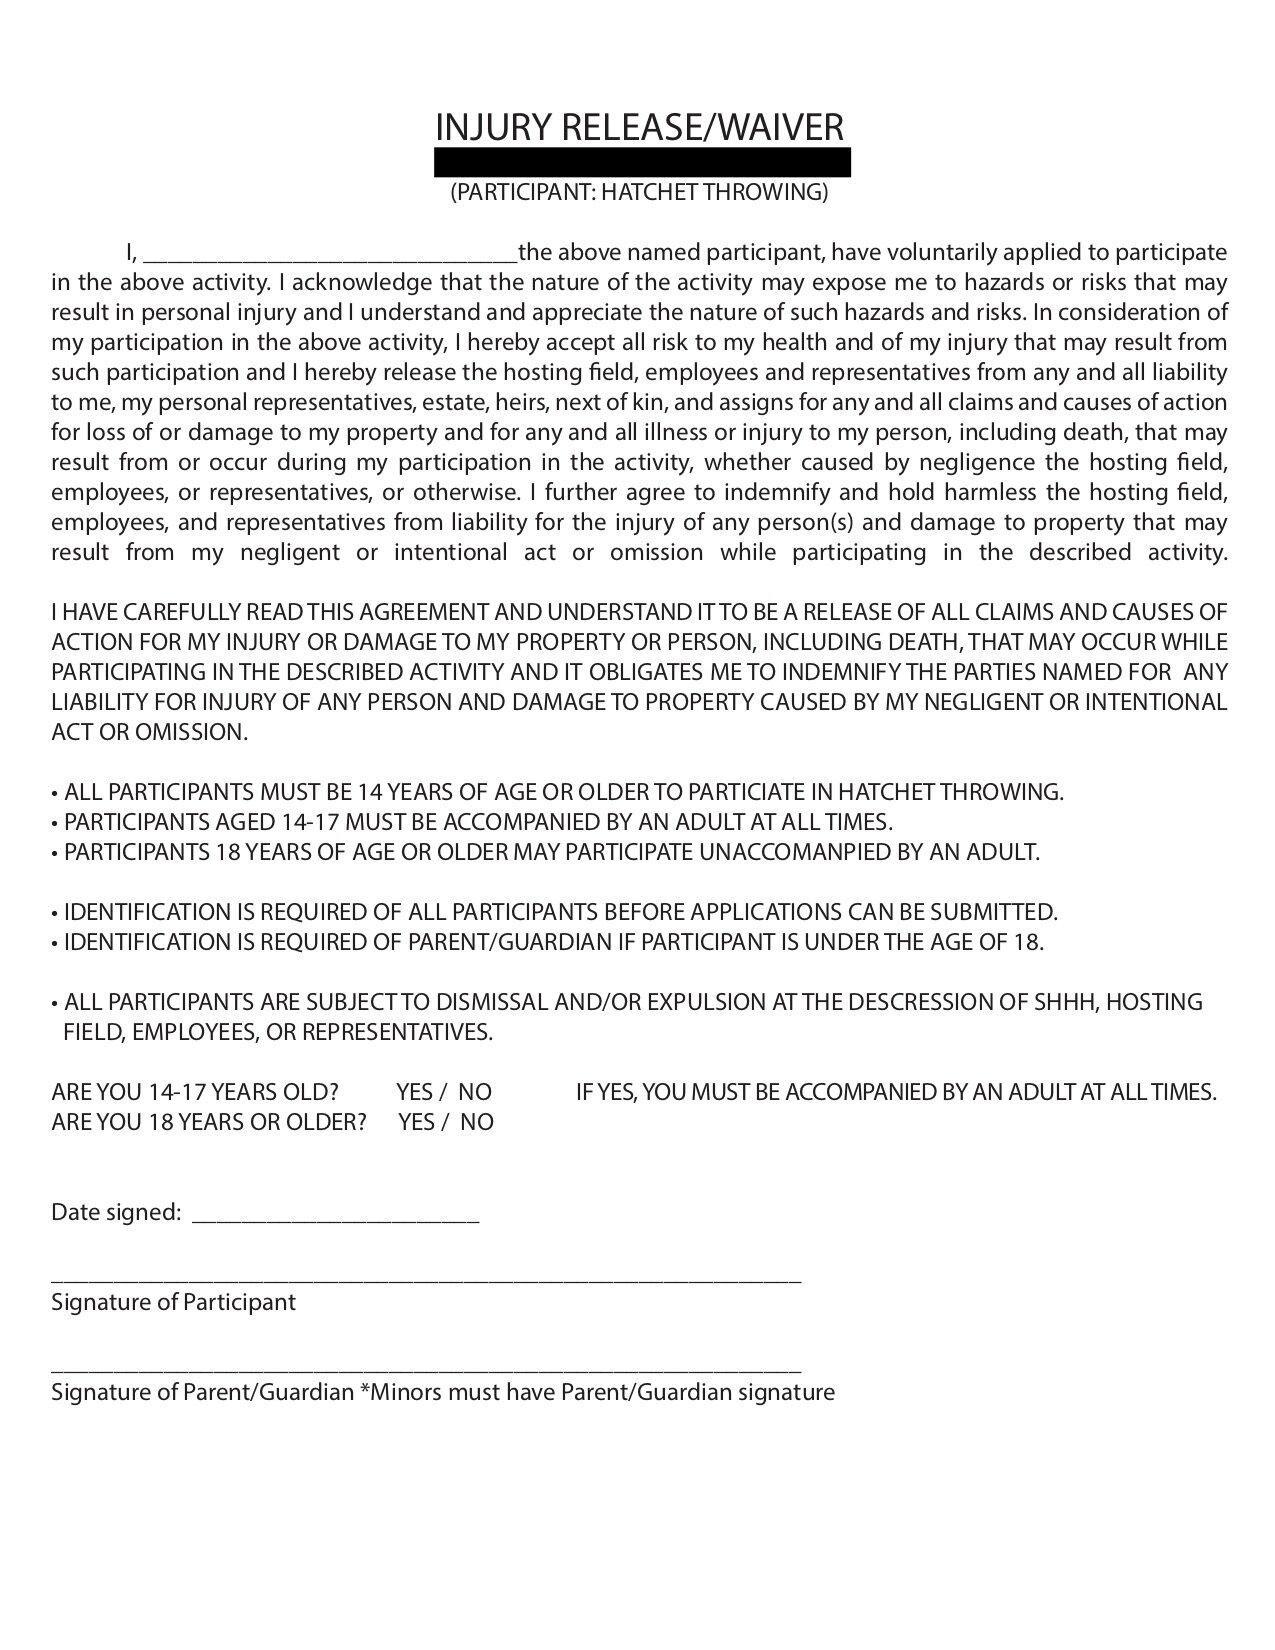 Copy of waiver(1).jpg